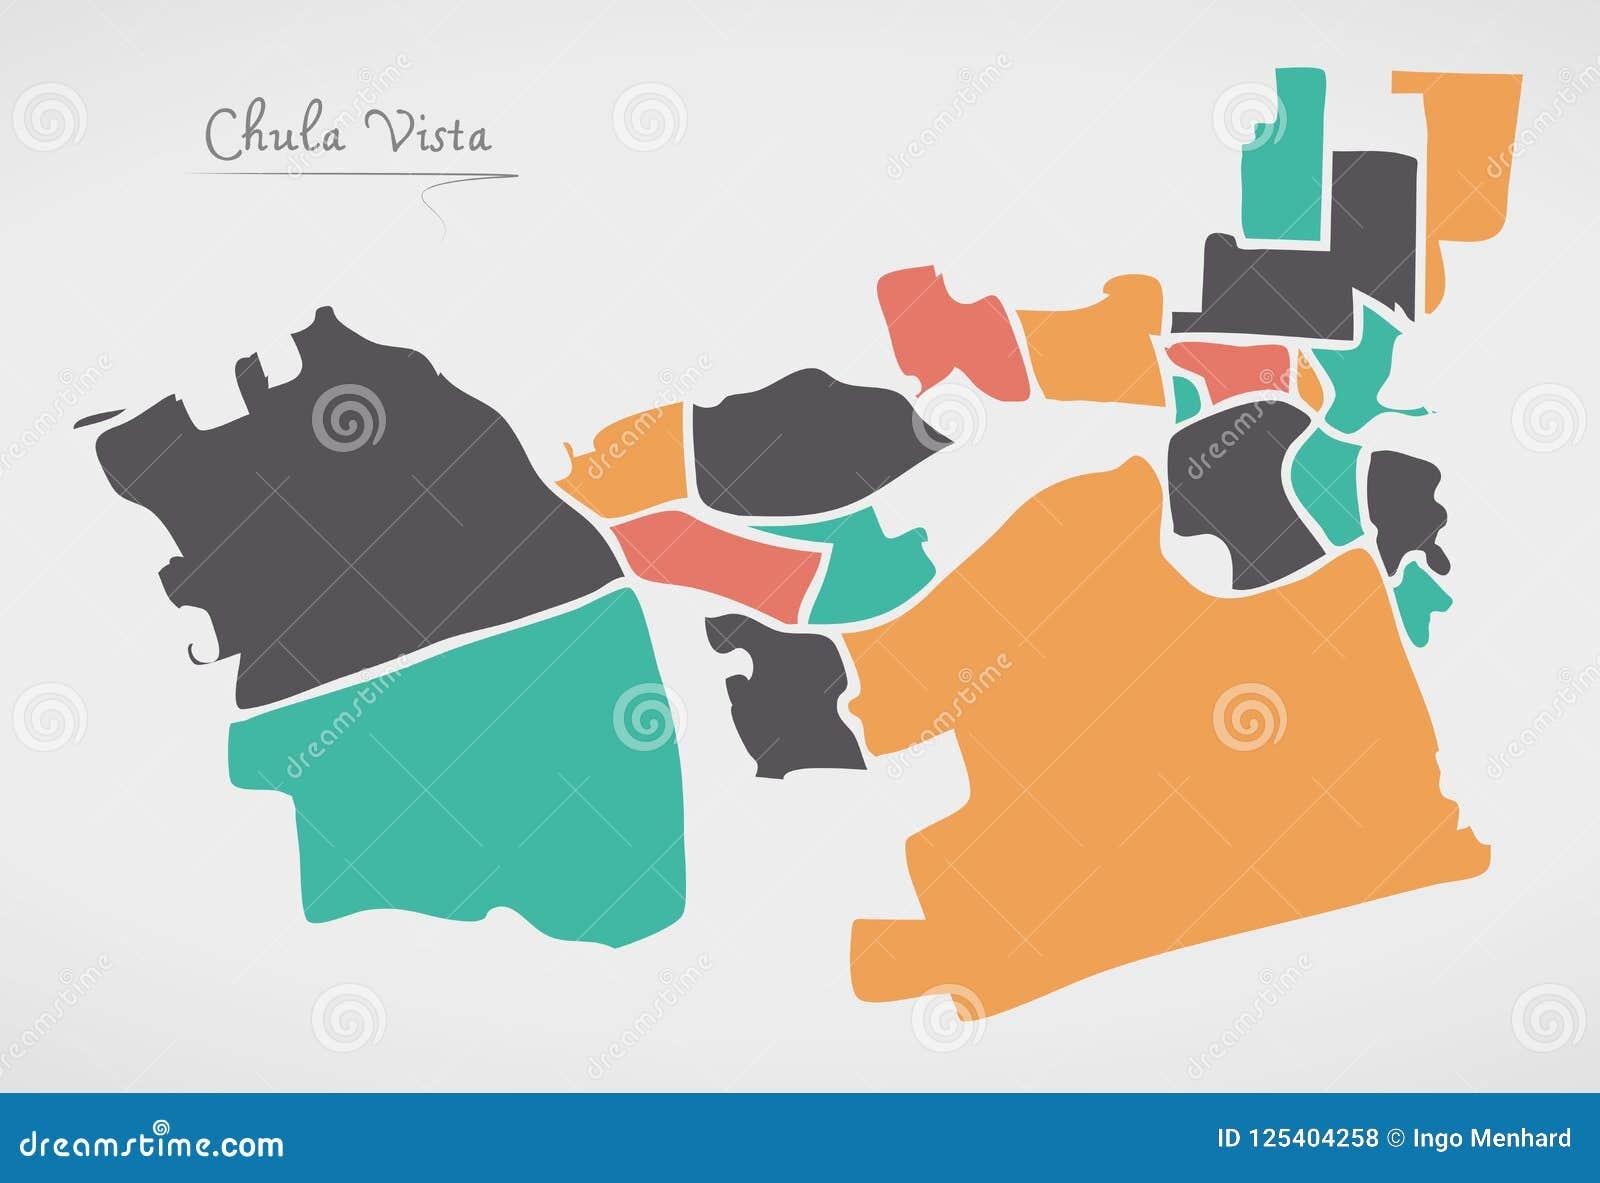 Chula Vista California Map With Neighborhoods And Modern Round S